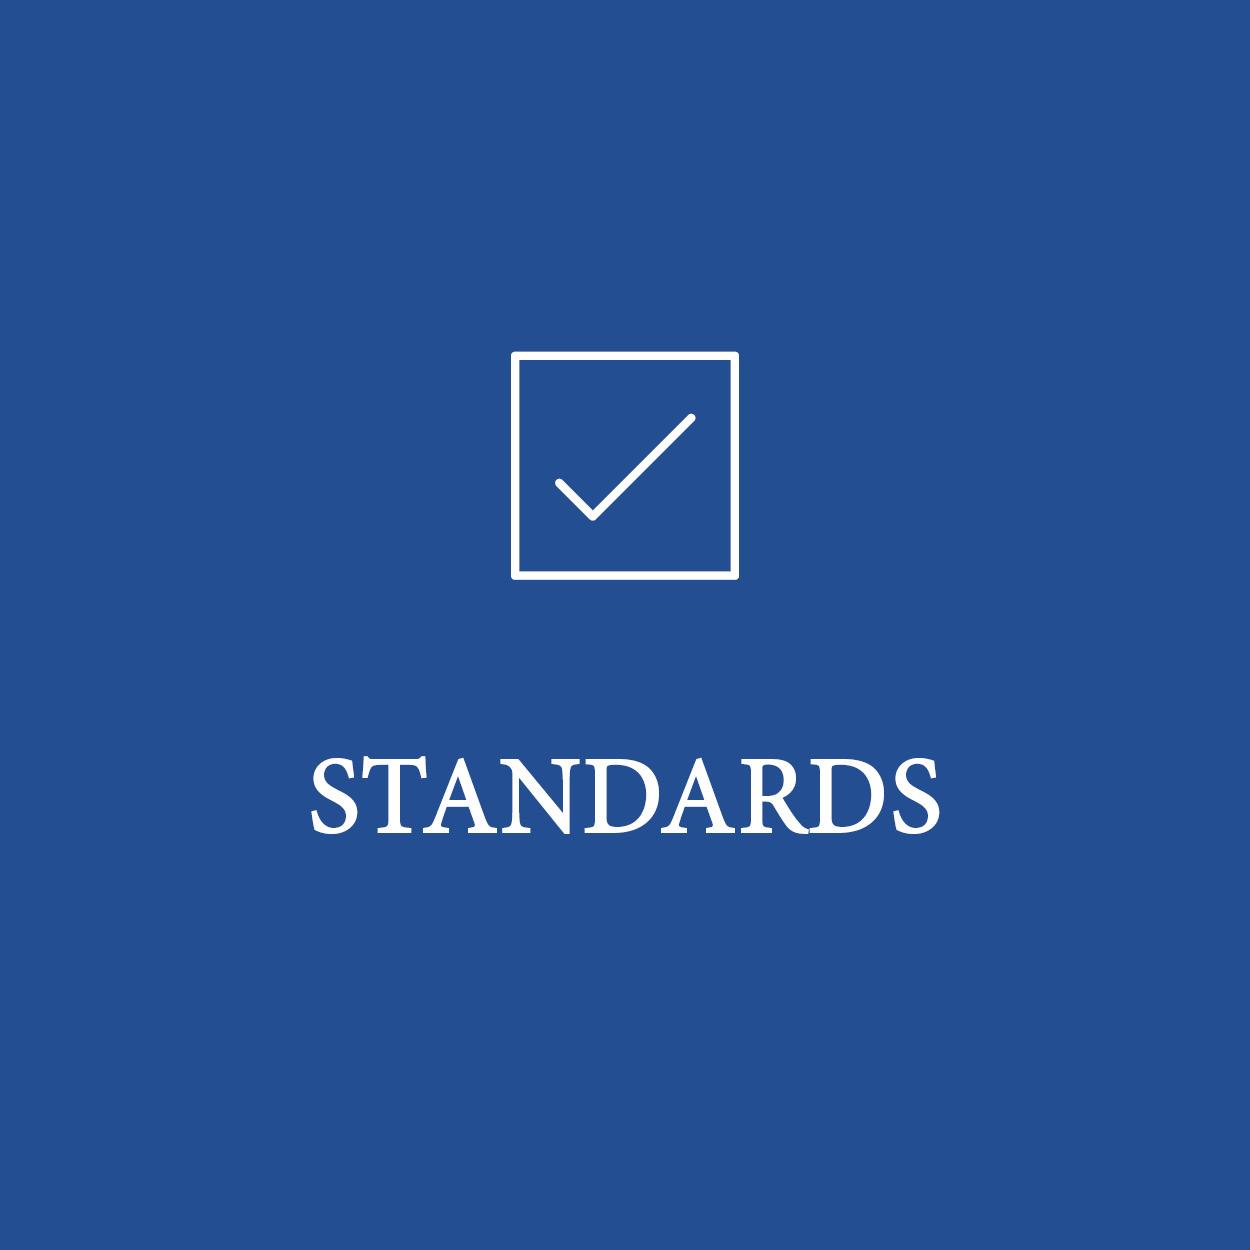 bettershoesfoundation_design_standards